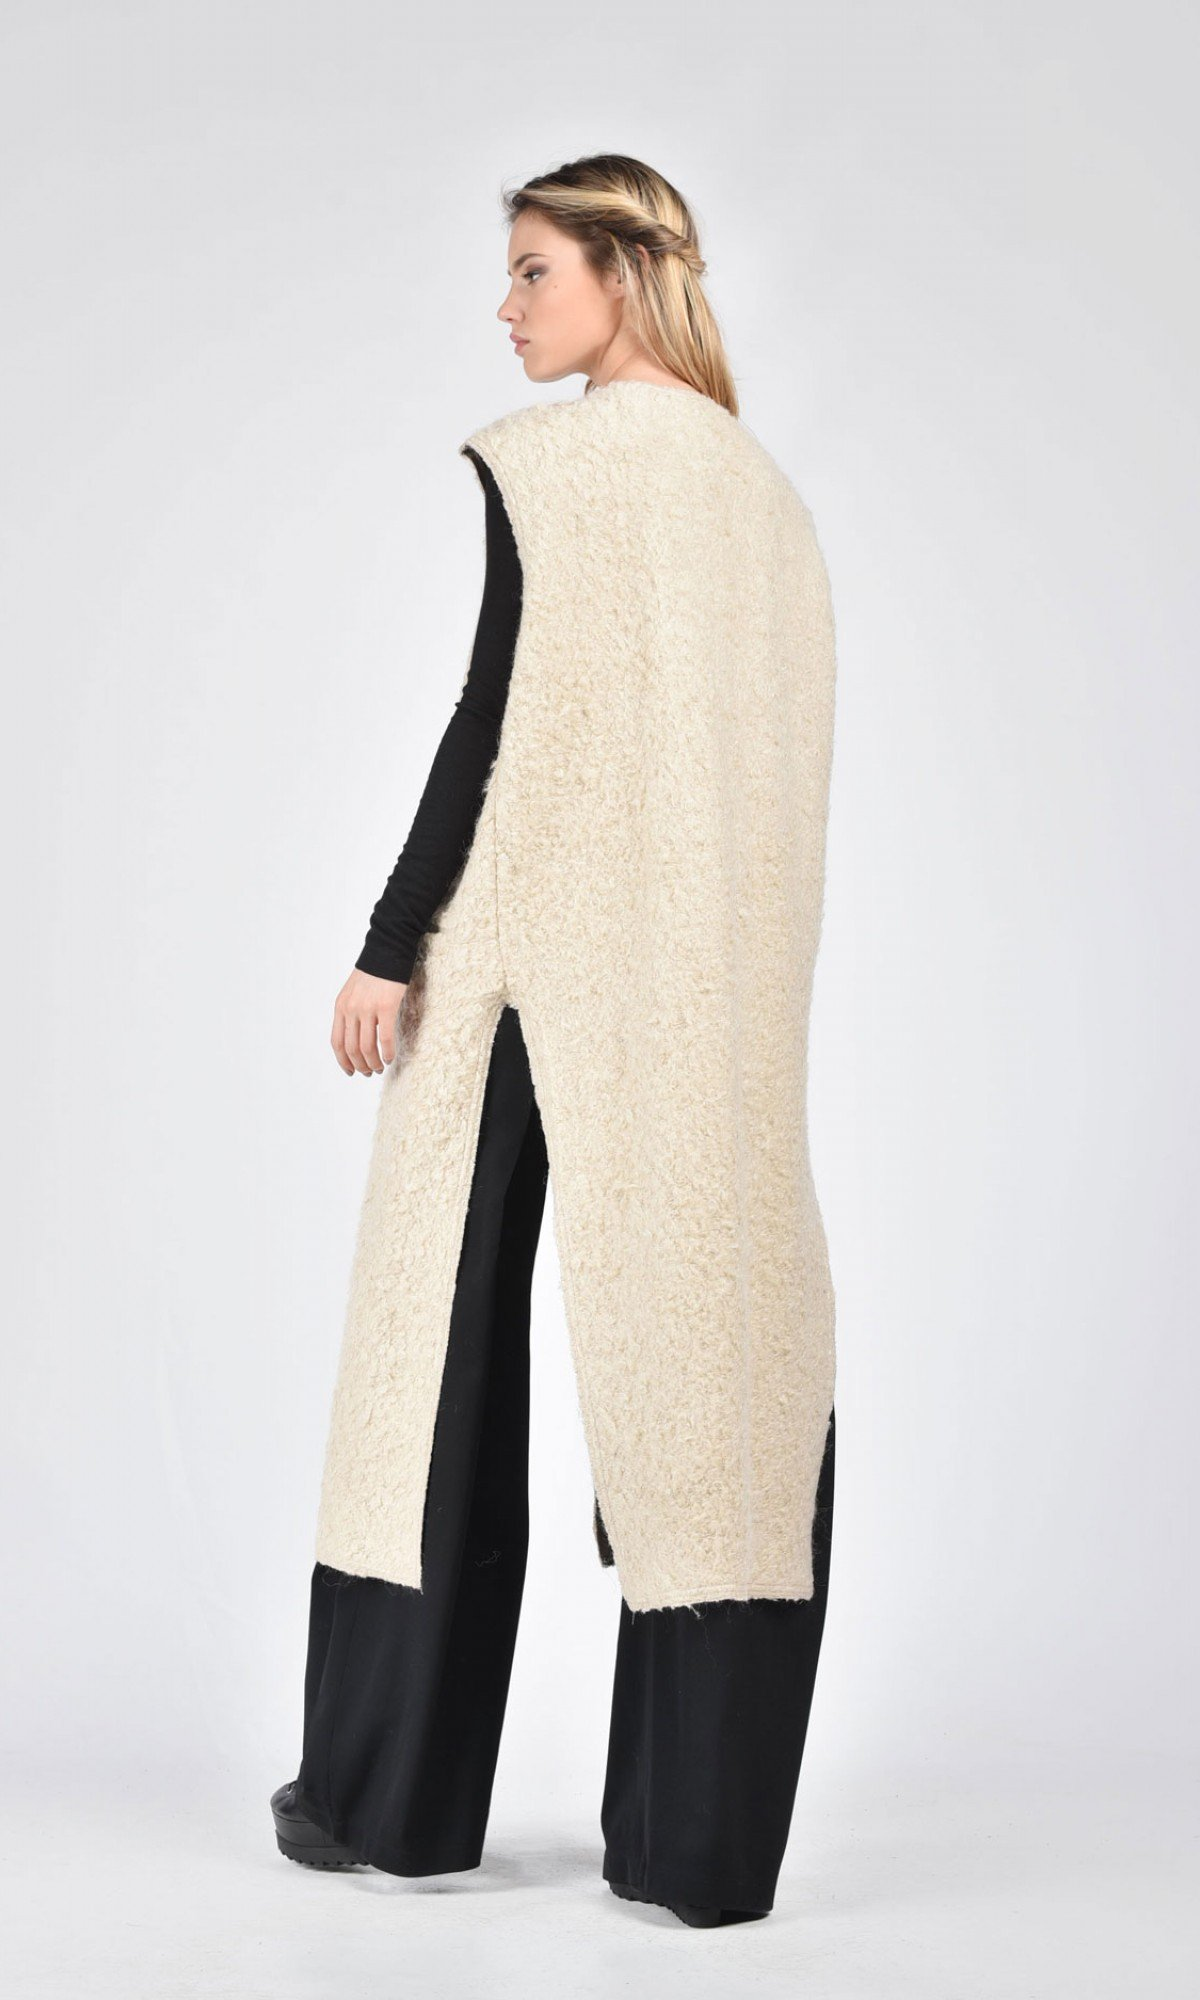 Winter Ivory Wool Sleeveless Vest A02174